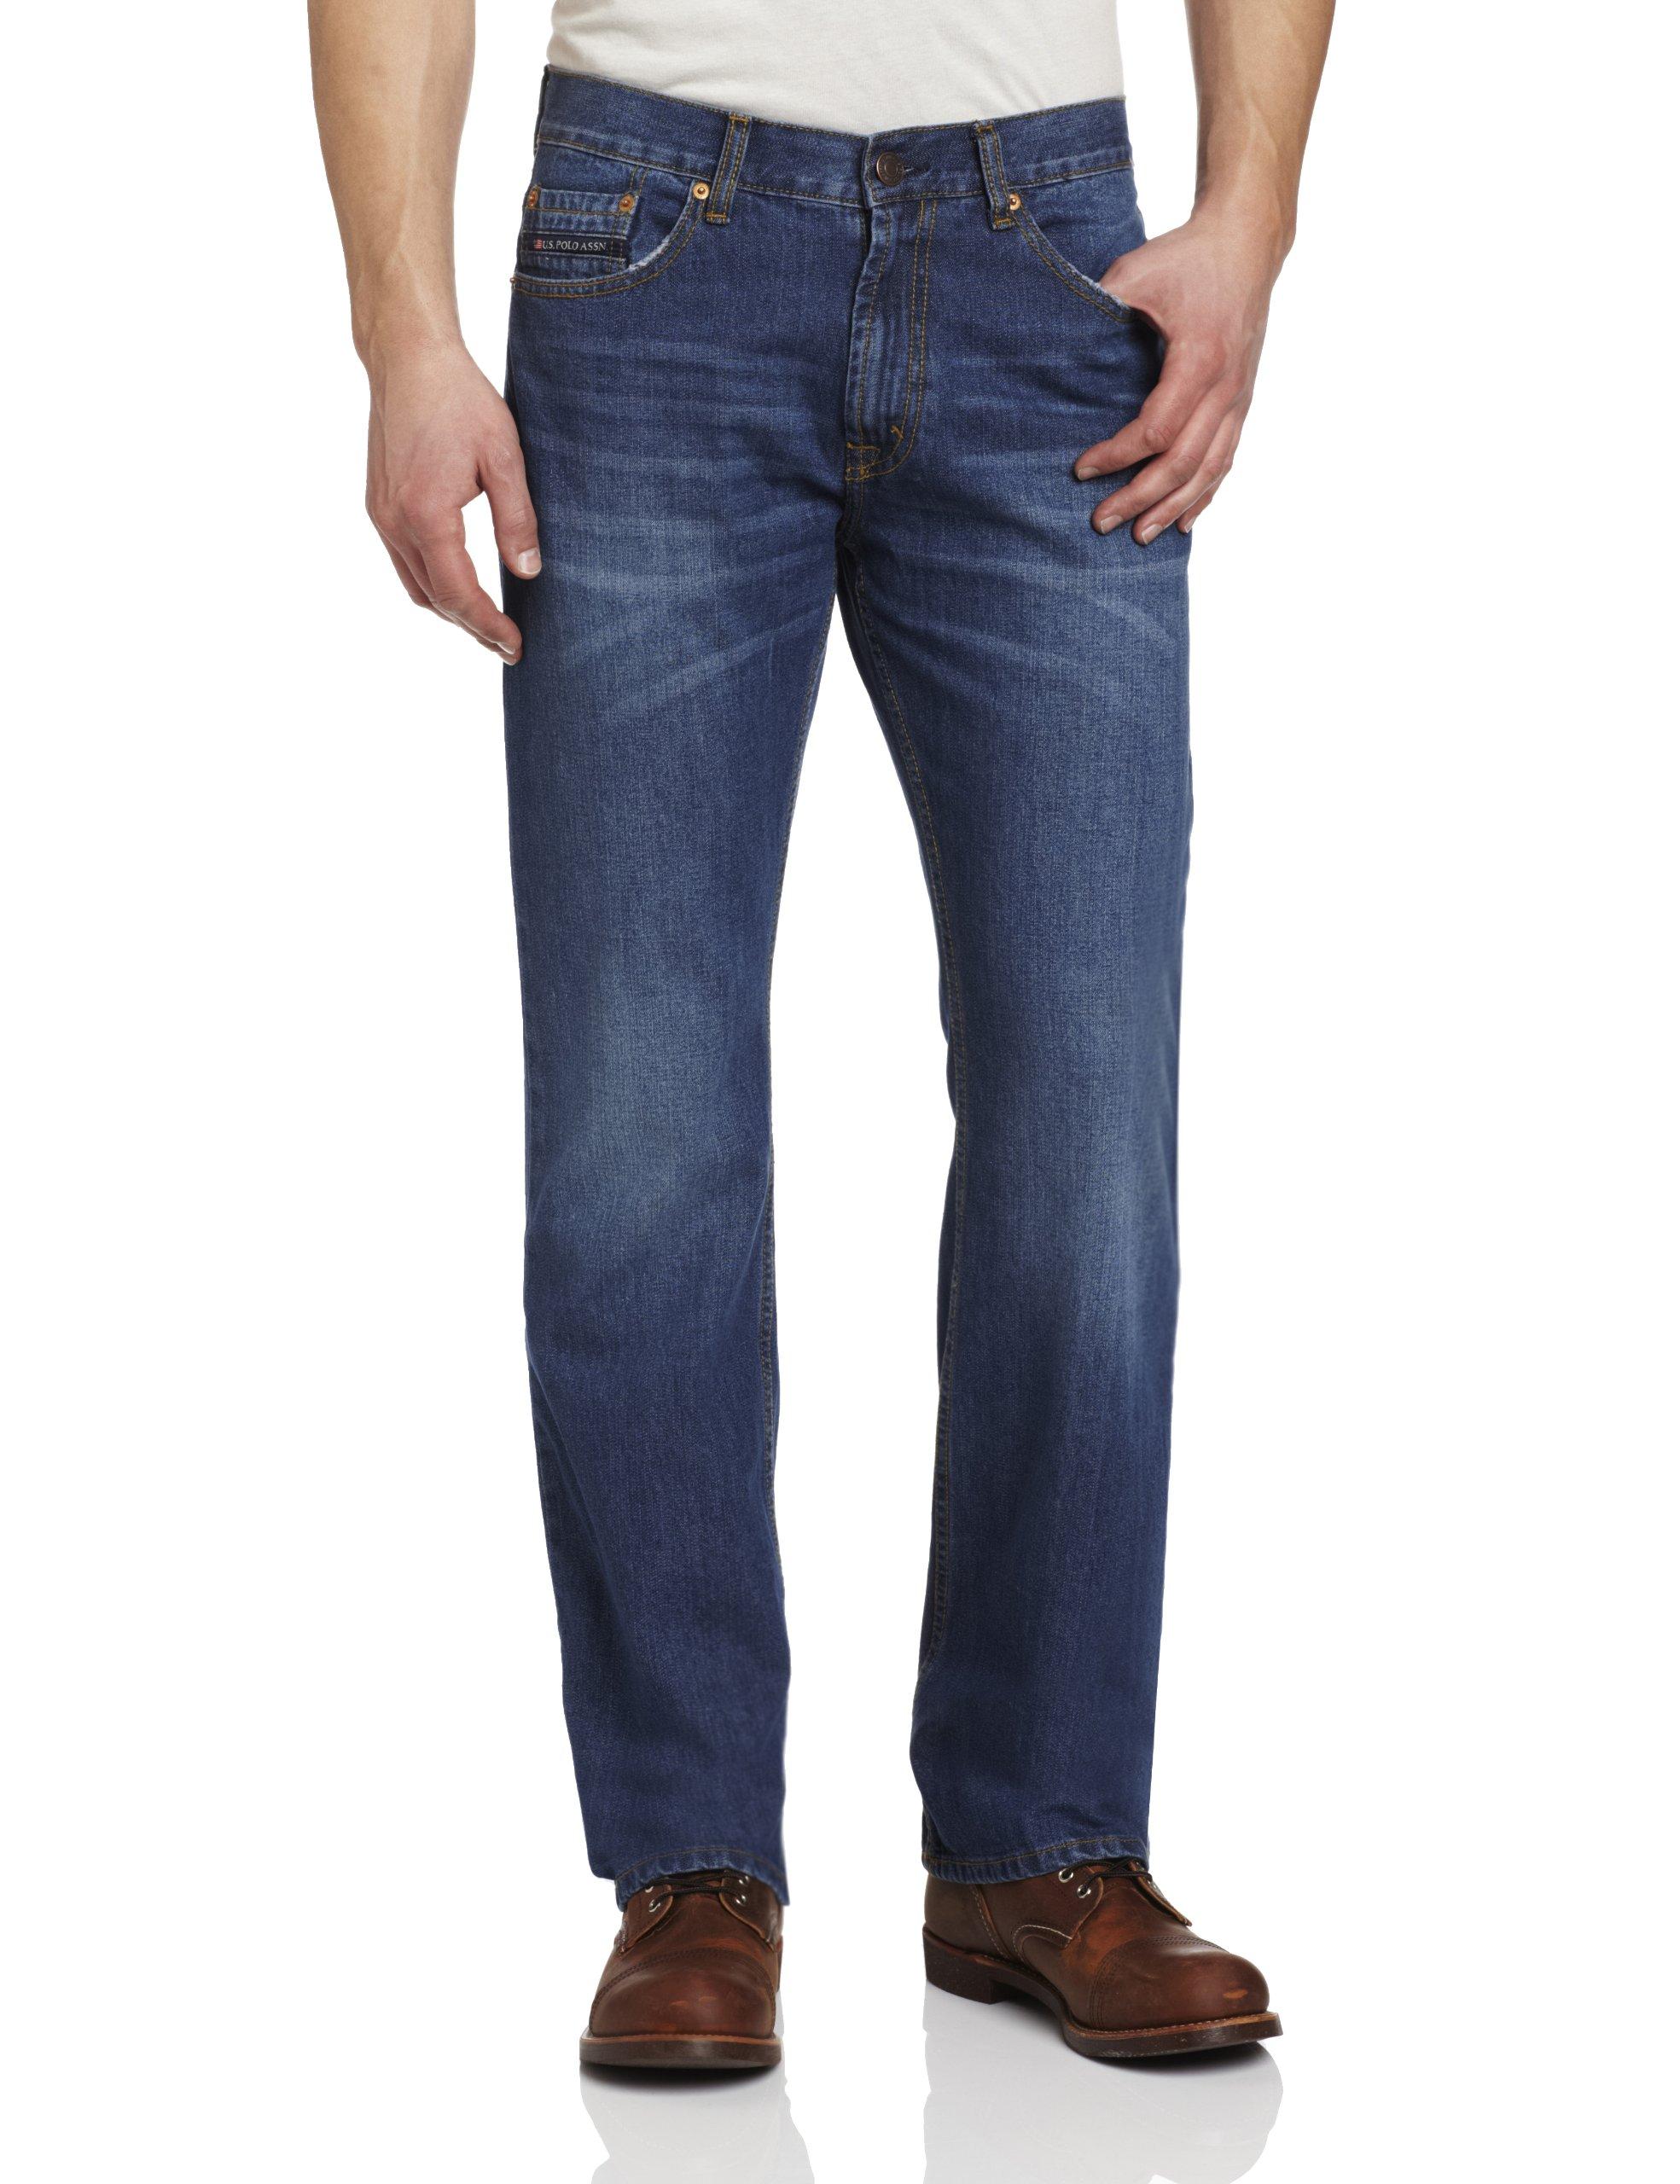 U.S. Polo Assn. Men's Five Pocket Boot Cut Jean,  Blue, 34x30